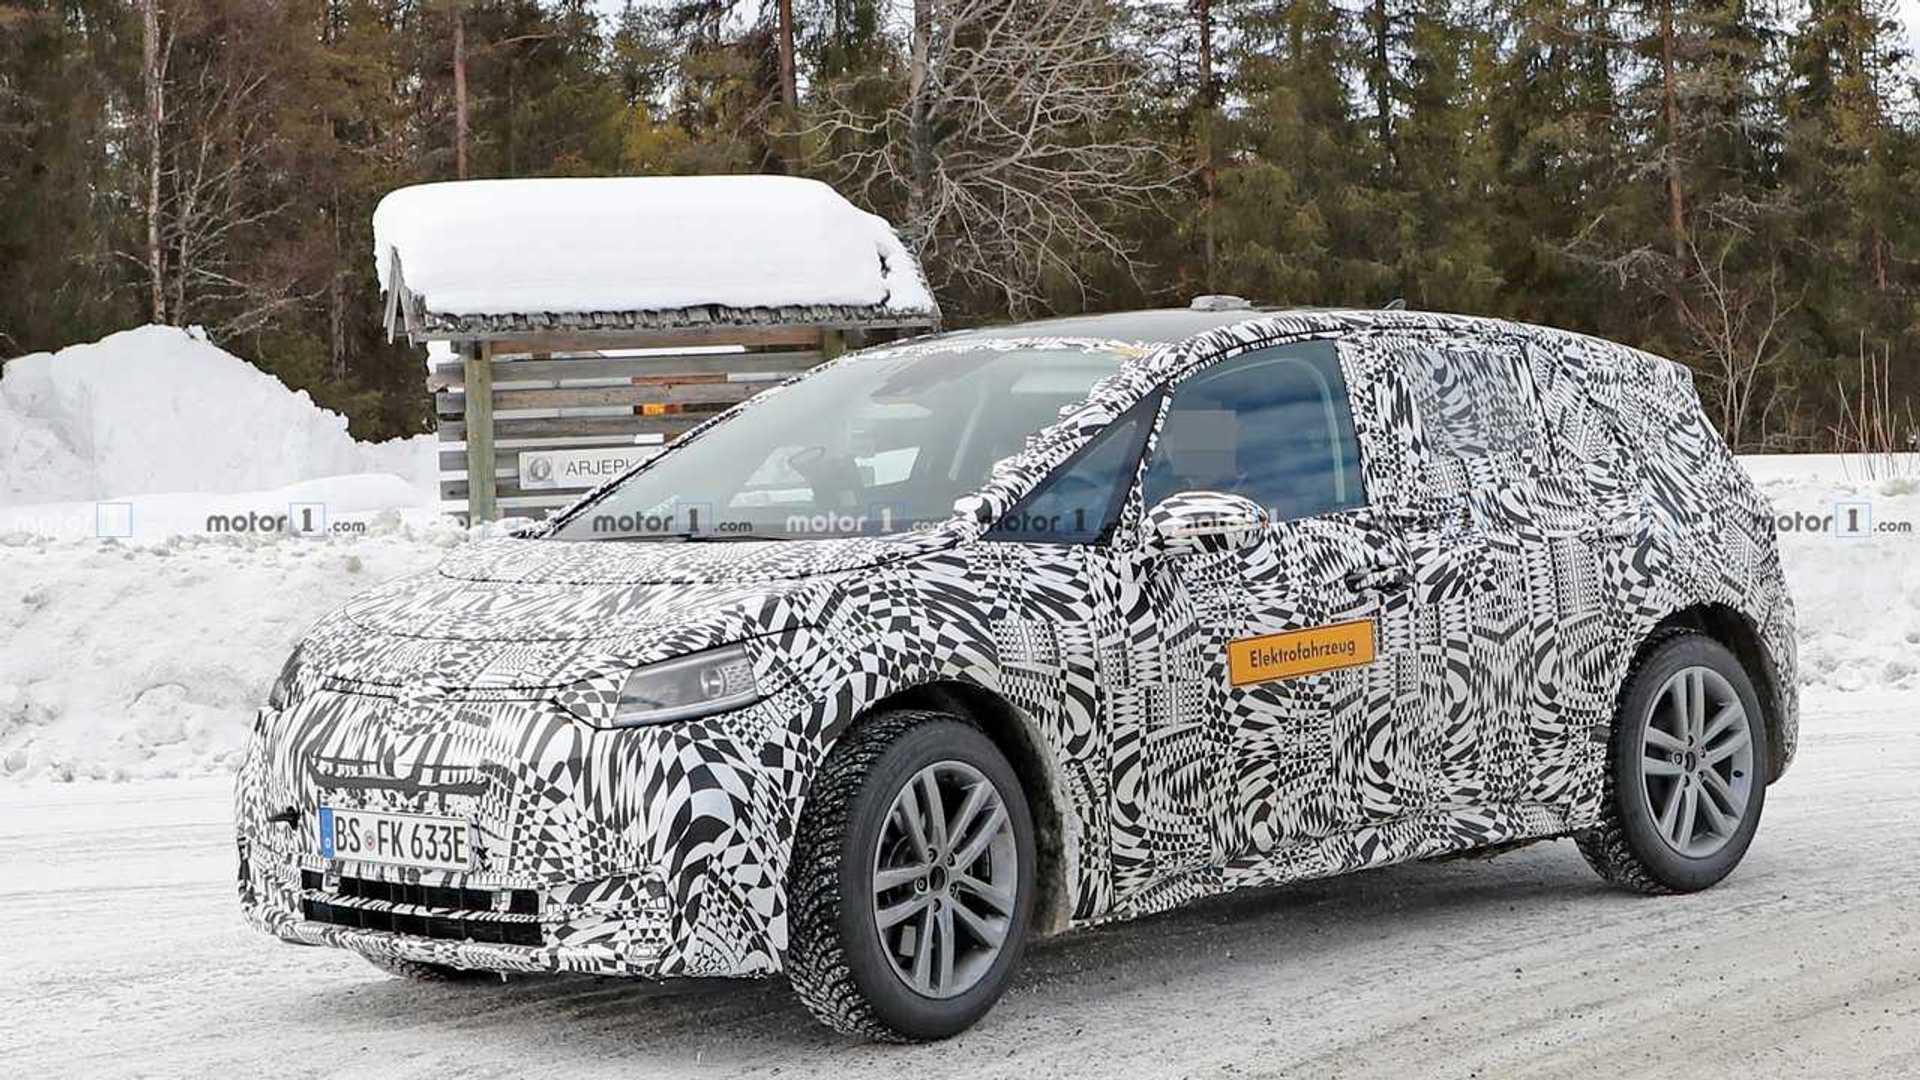 Volkswagen тестирует электрохэтч I.D. в снегу